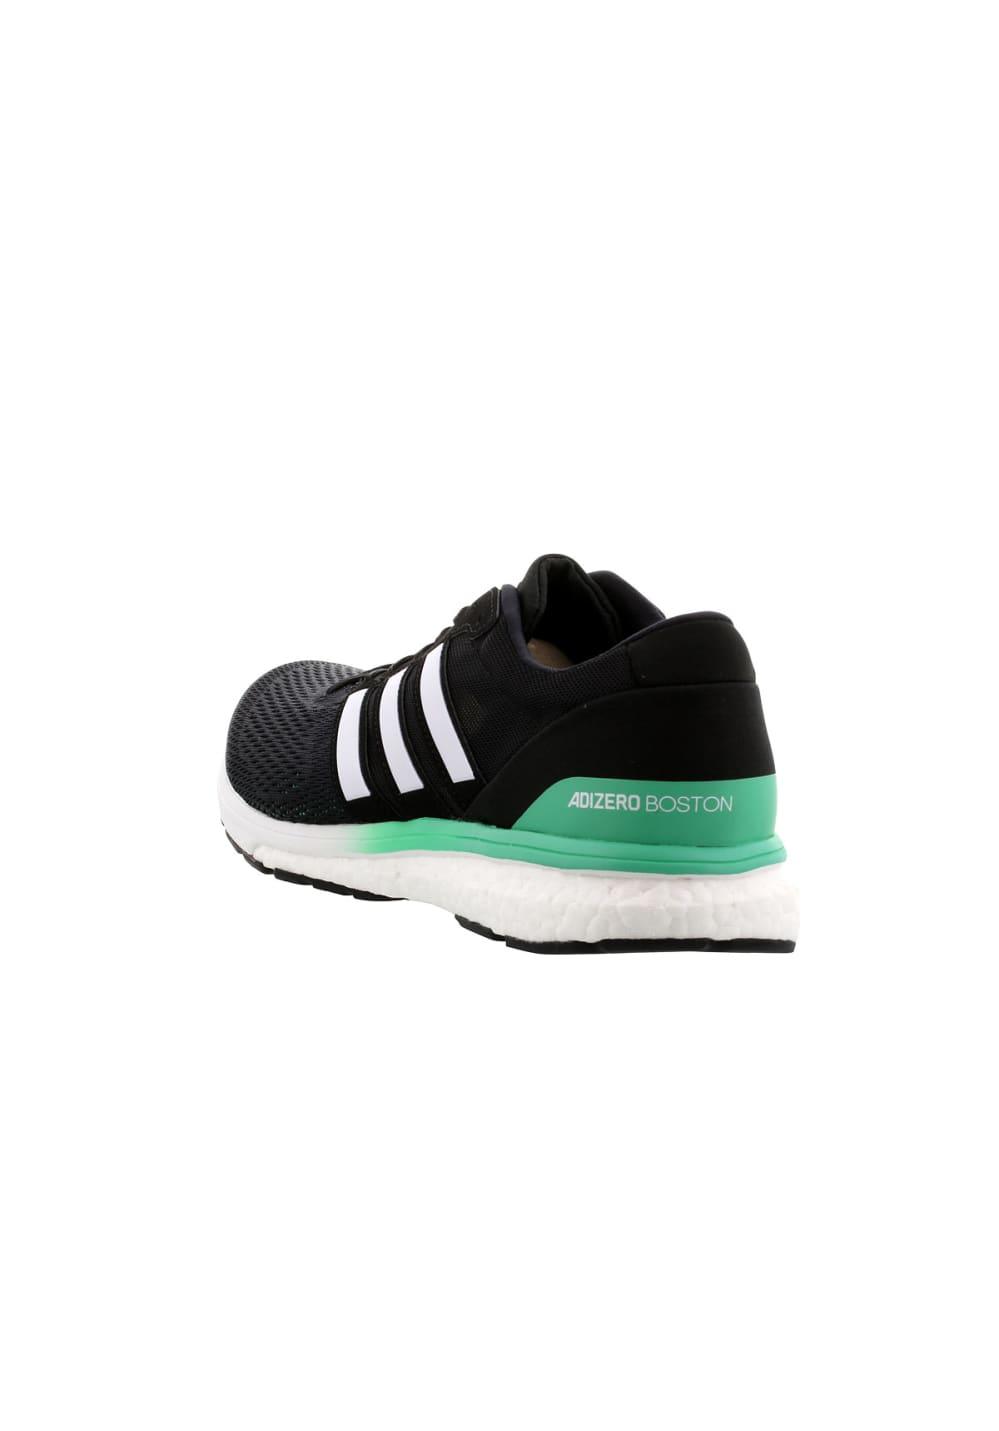 brand new 0b810 c50b3 adidas Adizero Boston 6 - Laufschuhe für Damen - Schwarz  21